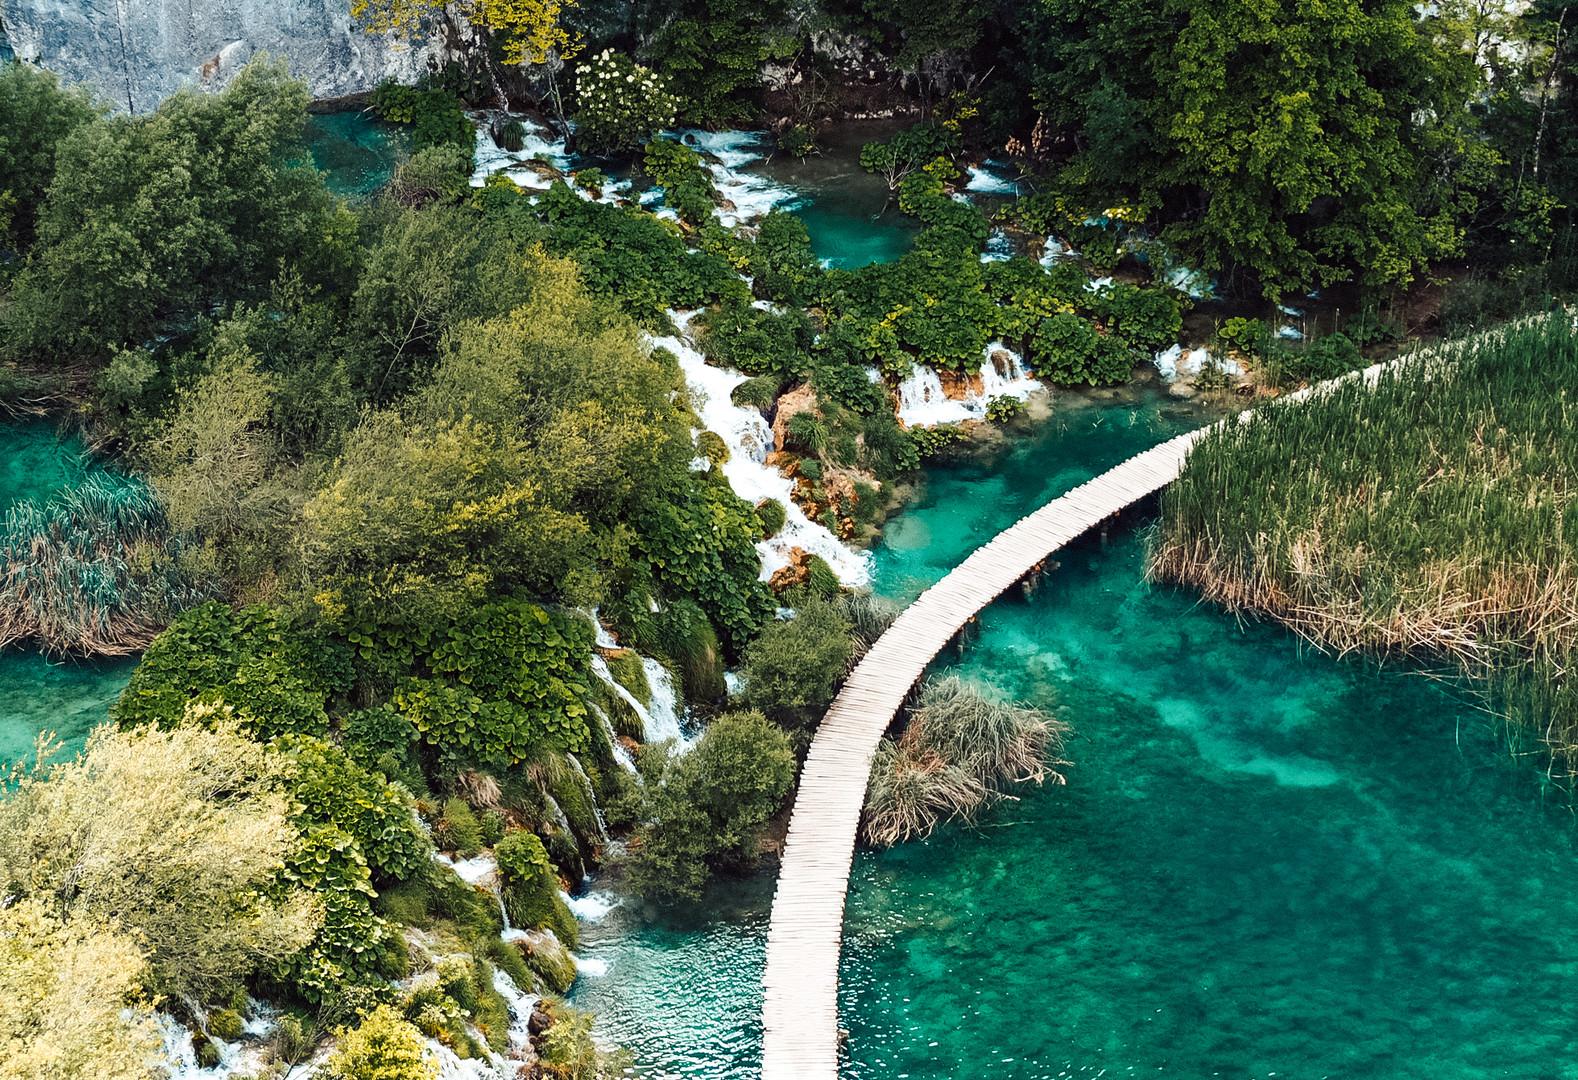 Plitvice Lakes National Park, Croatia #6